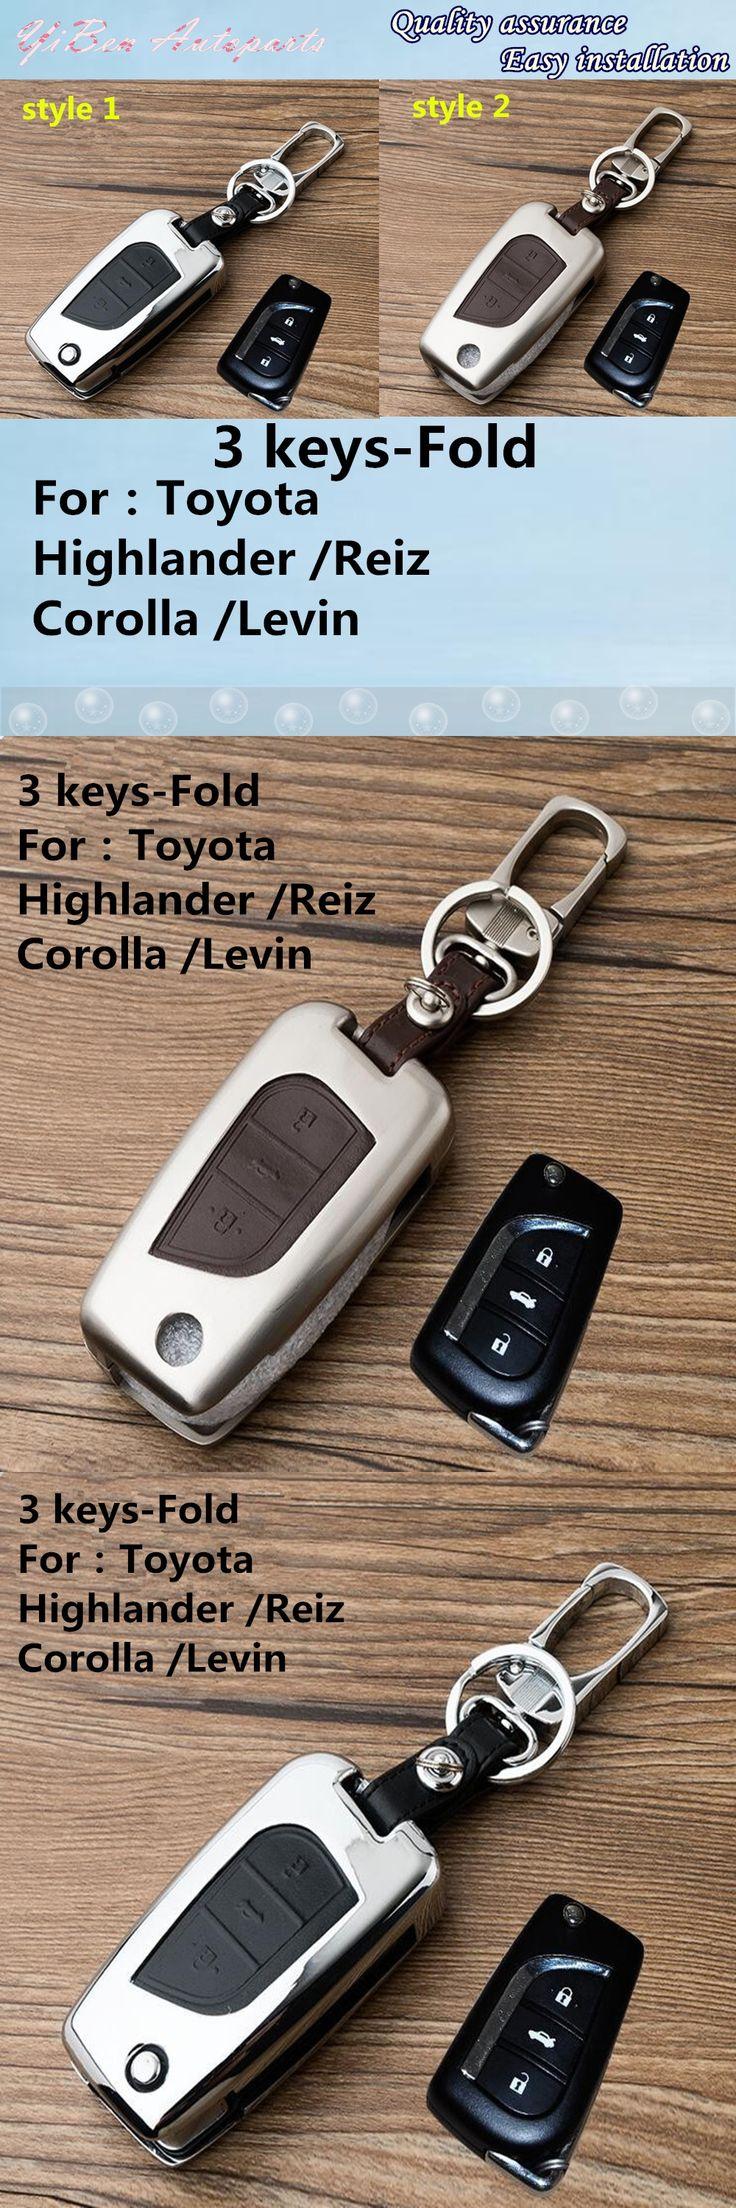 For T0Y0TA Highlander Reiz Corolla Levin Mark-X car leather+Zinc alloy Metal keys bag case key chain Wallet fold lamp 1pcs